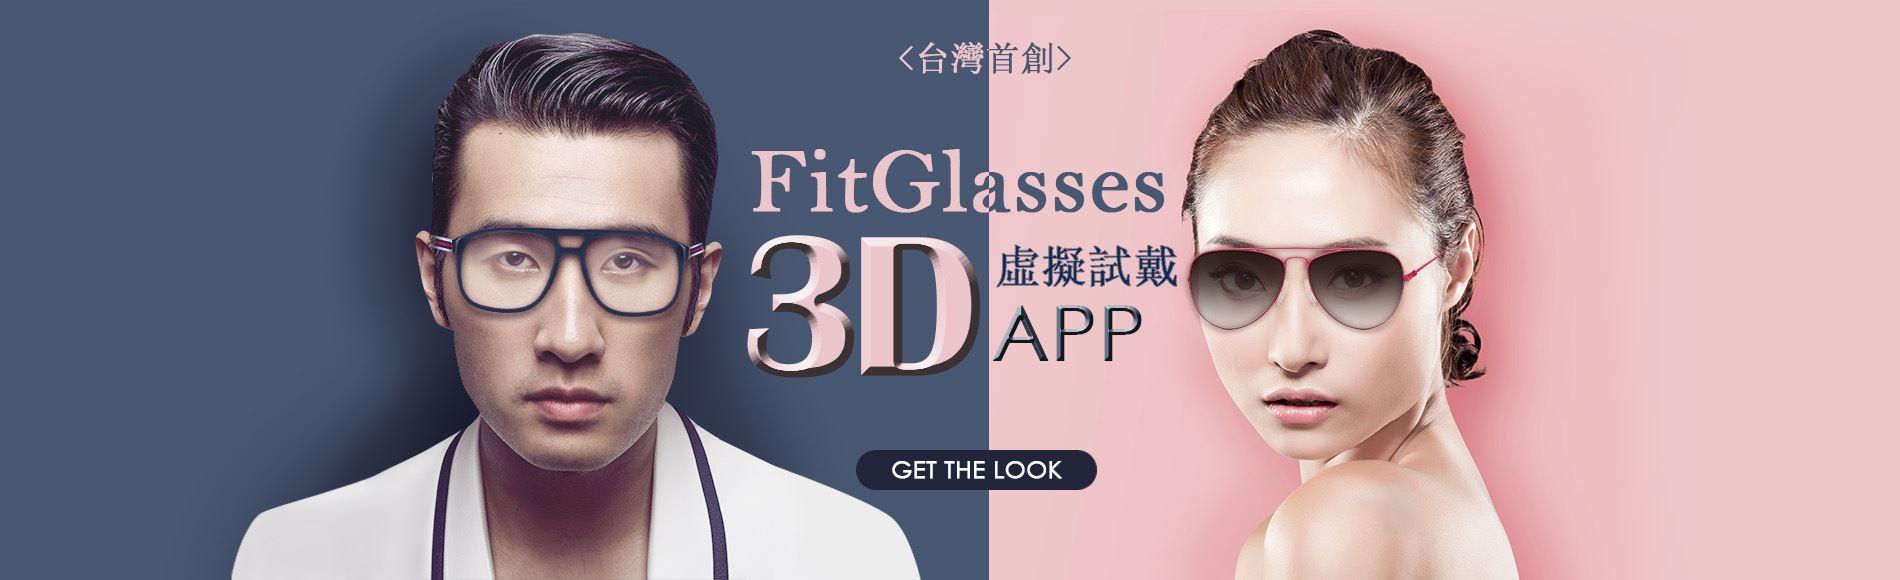 FitGlasses.com視鏡空間 眼鏡3D虛擬試戴APP